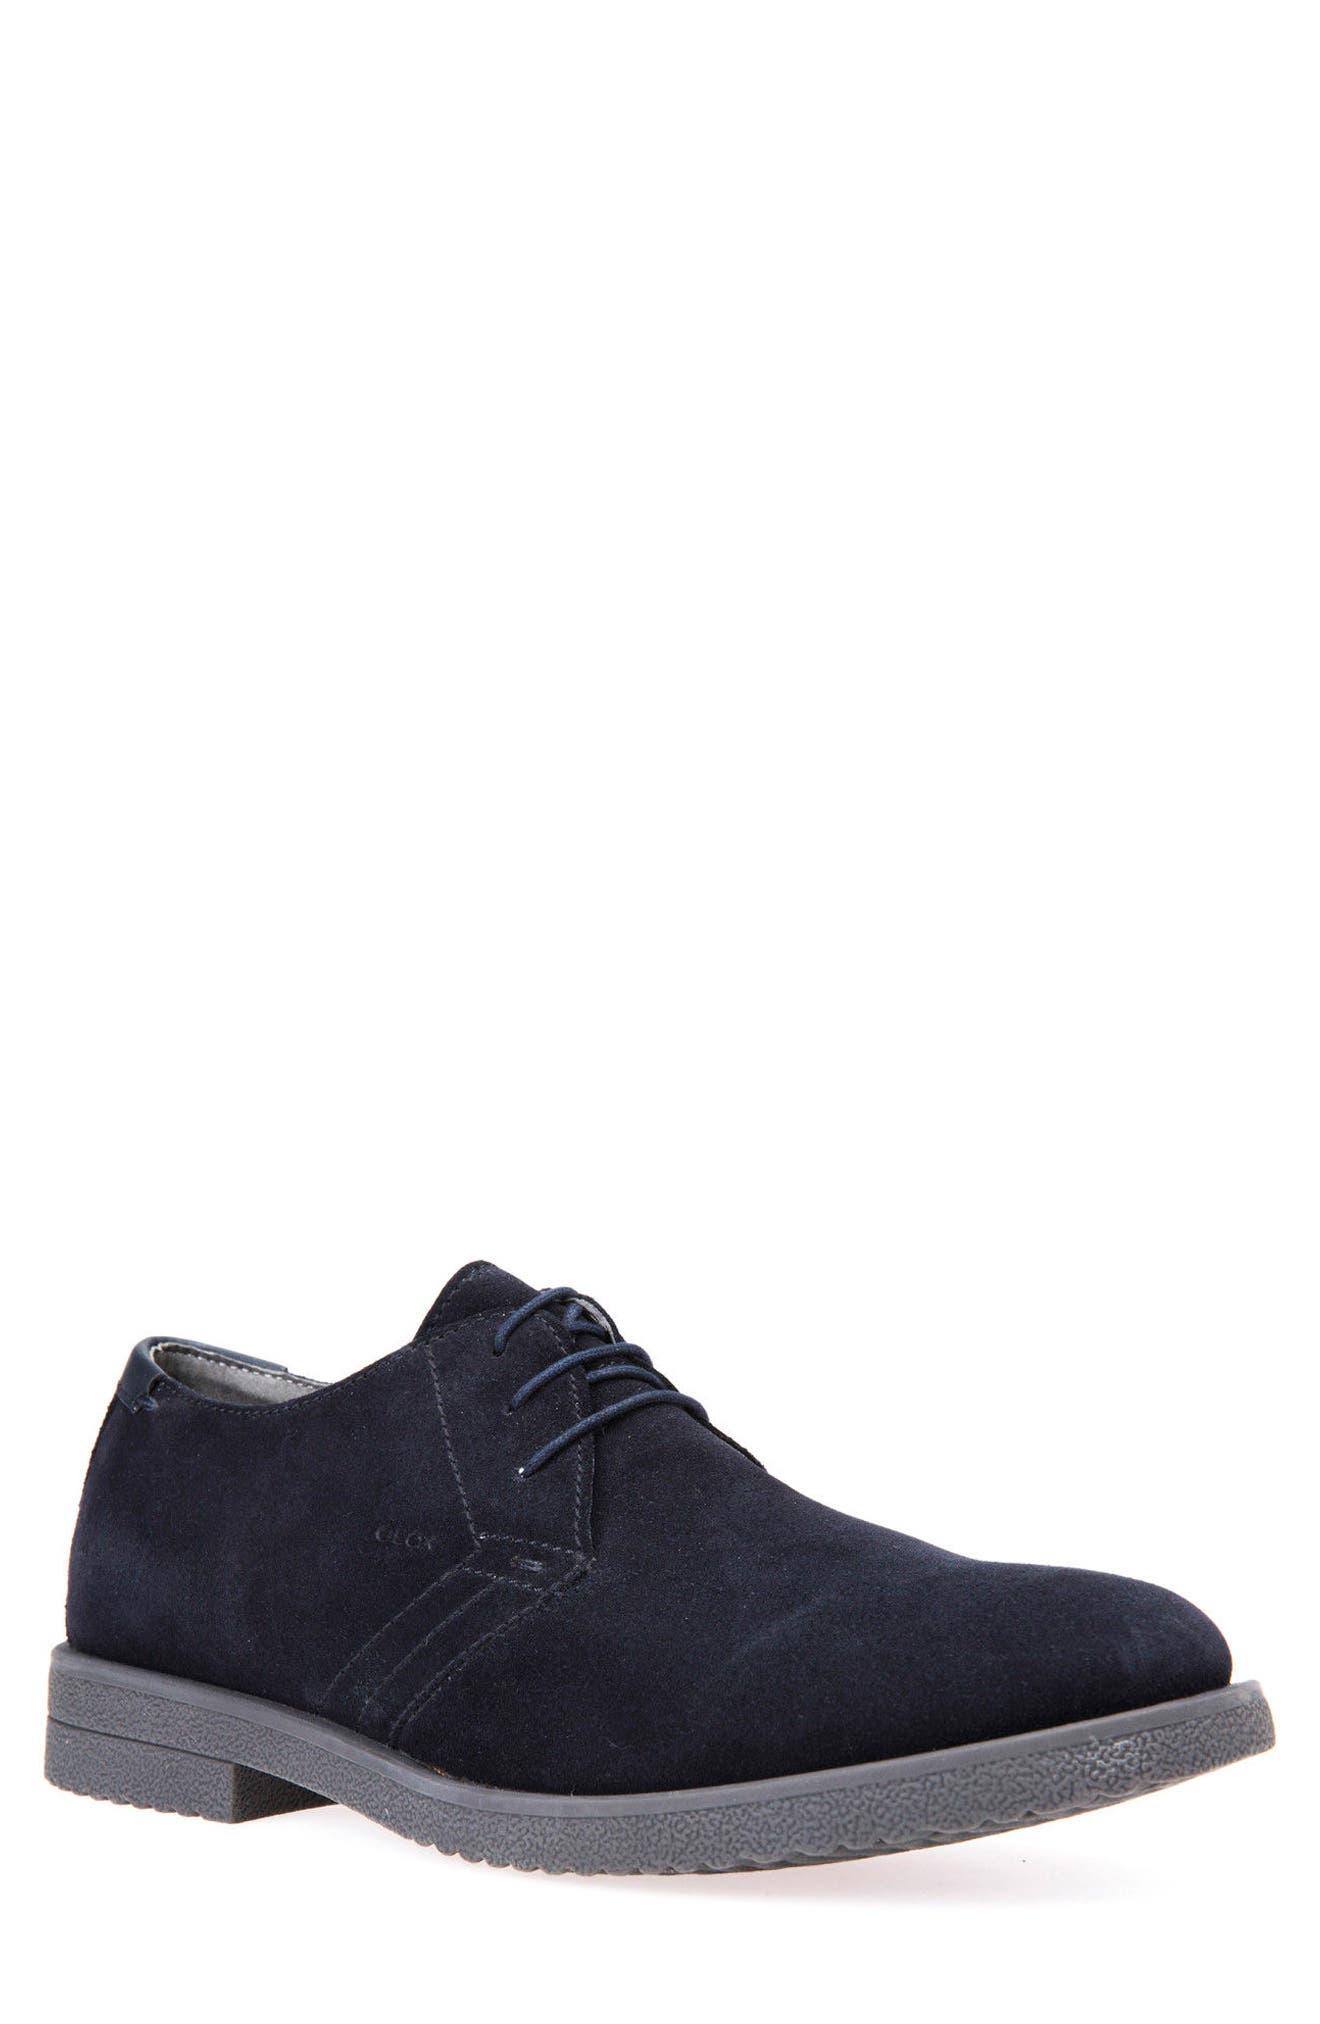 Geox Brandled Buck Shoe (Men)